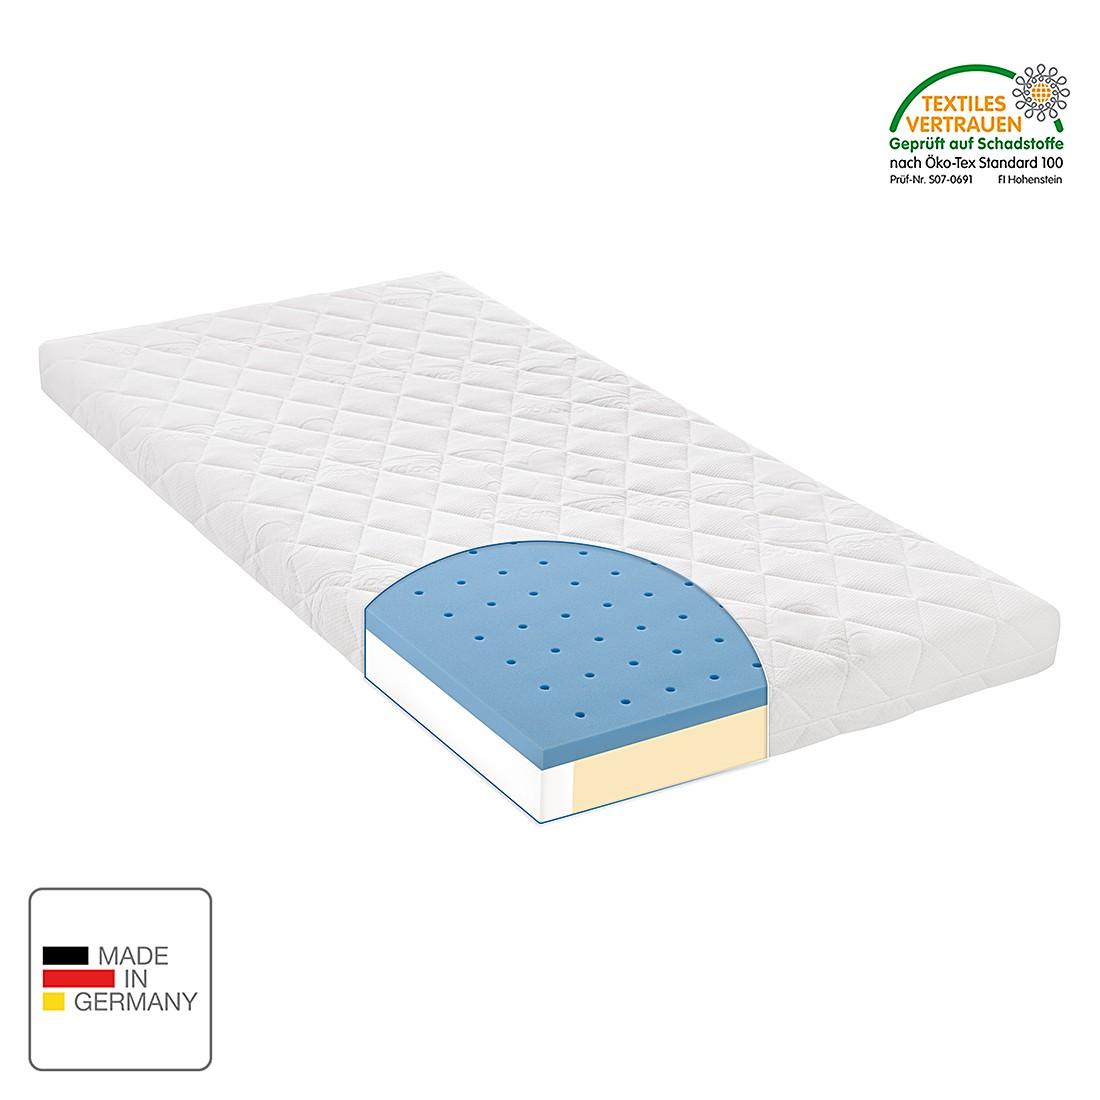 Materasso per bambini Sky Comfort -Superficie letto: 70 x 140 cm, Julius Zöllner